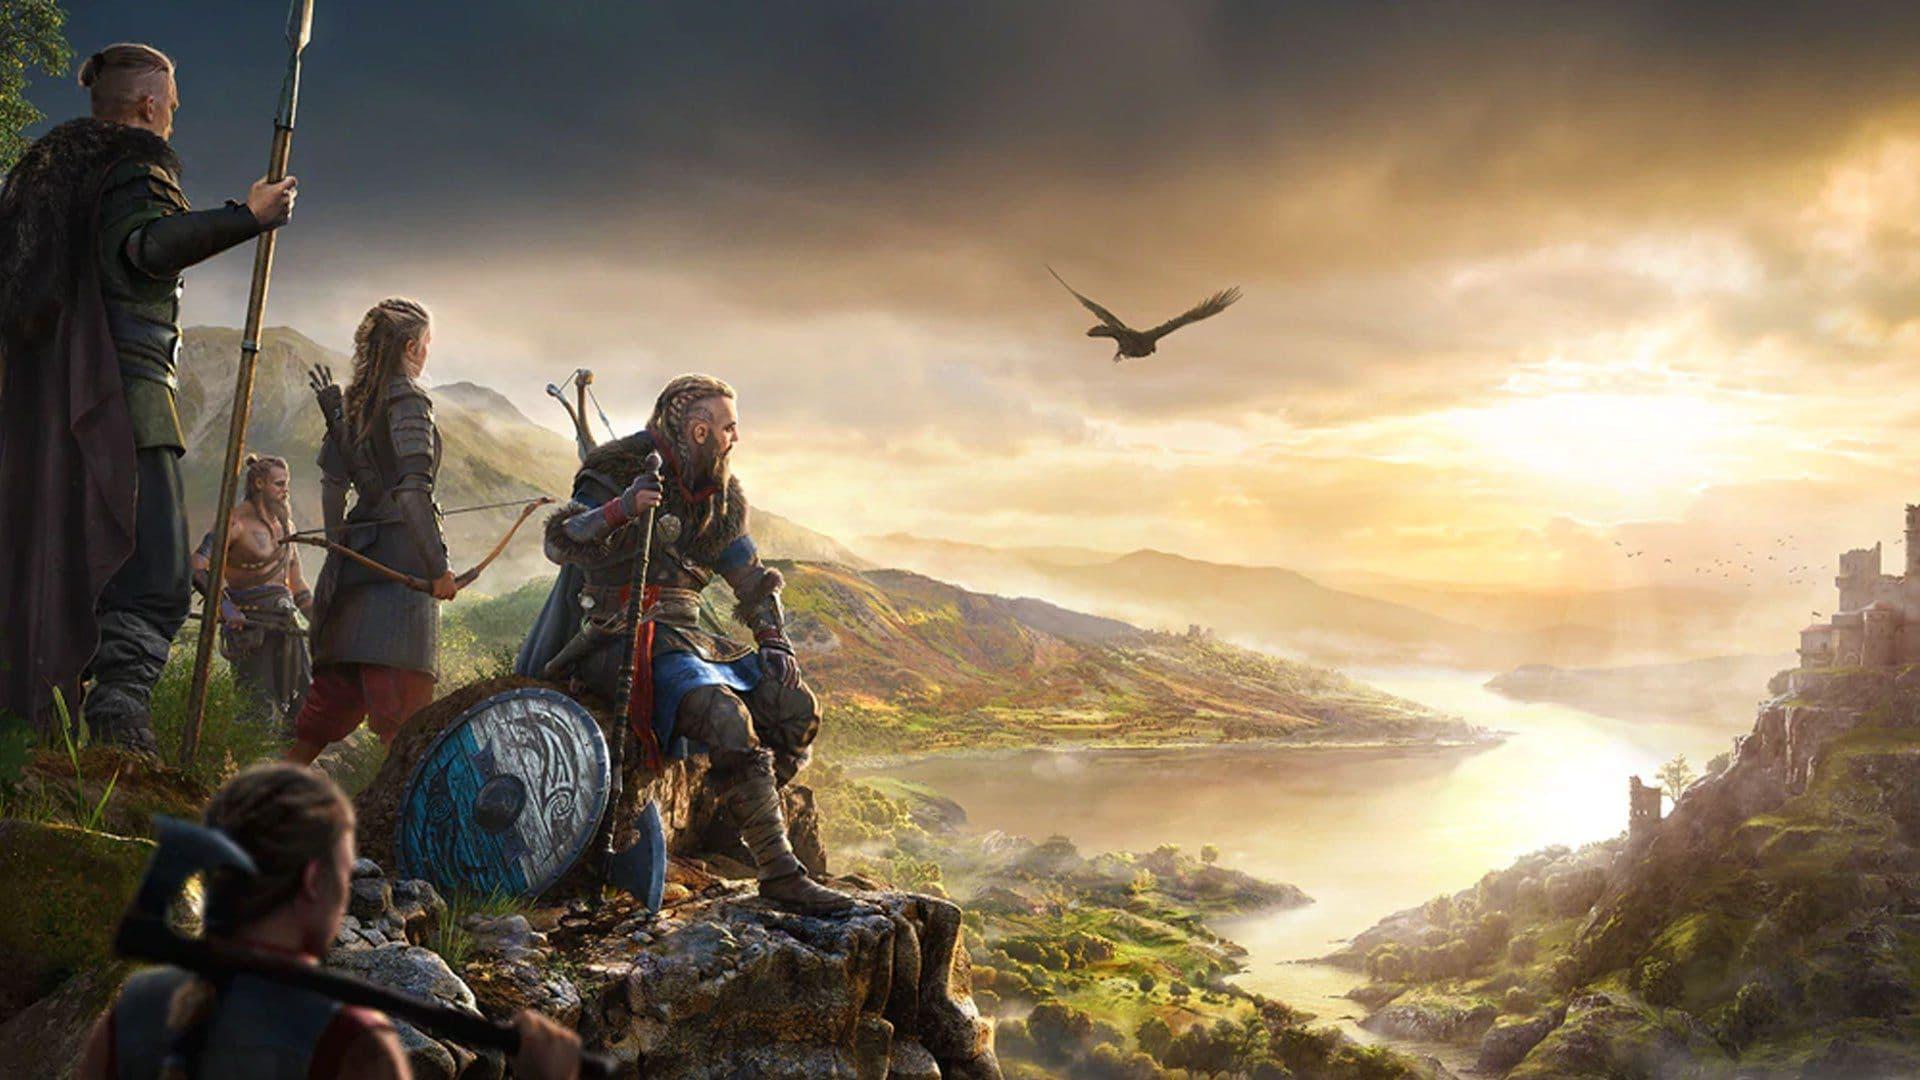 Assassin's Creed Valhalla gets a next-gen update